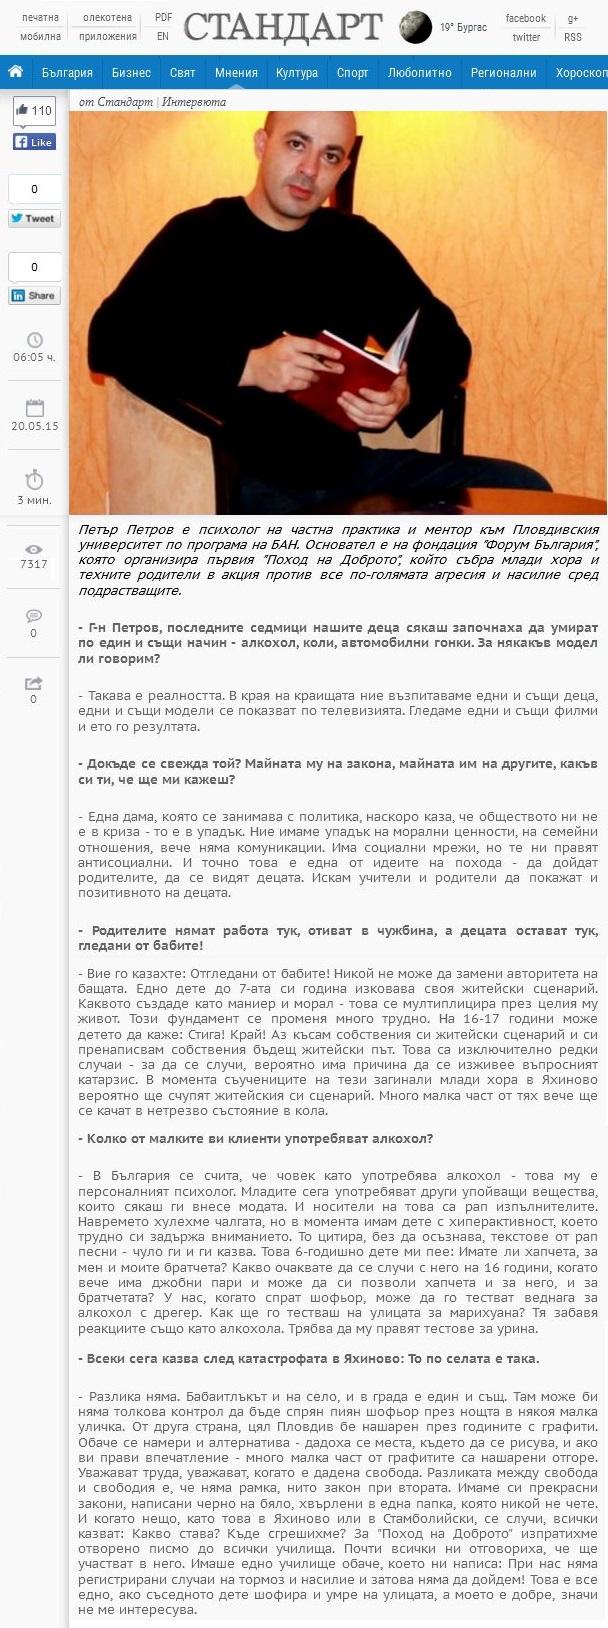 ПСИХОЛОГ ПЕТЪР ПЕТРОВ STANDARTNEWS.COM